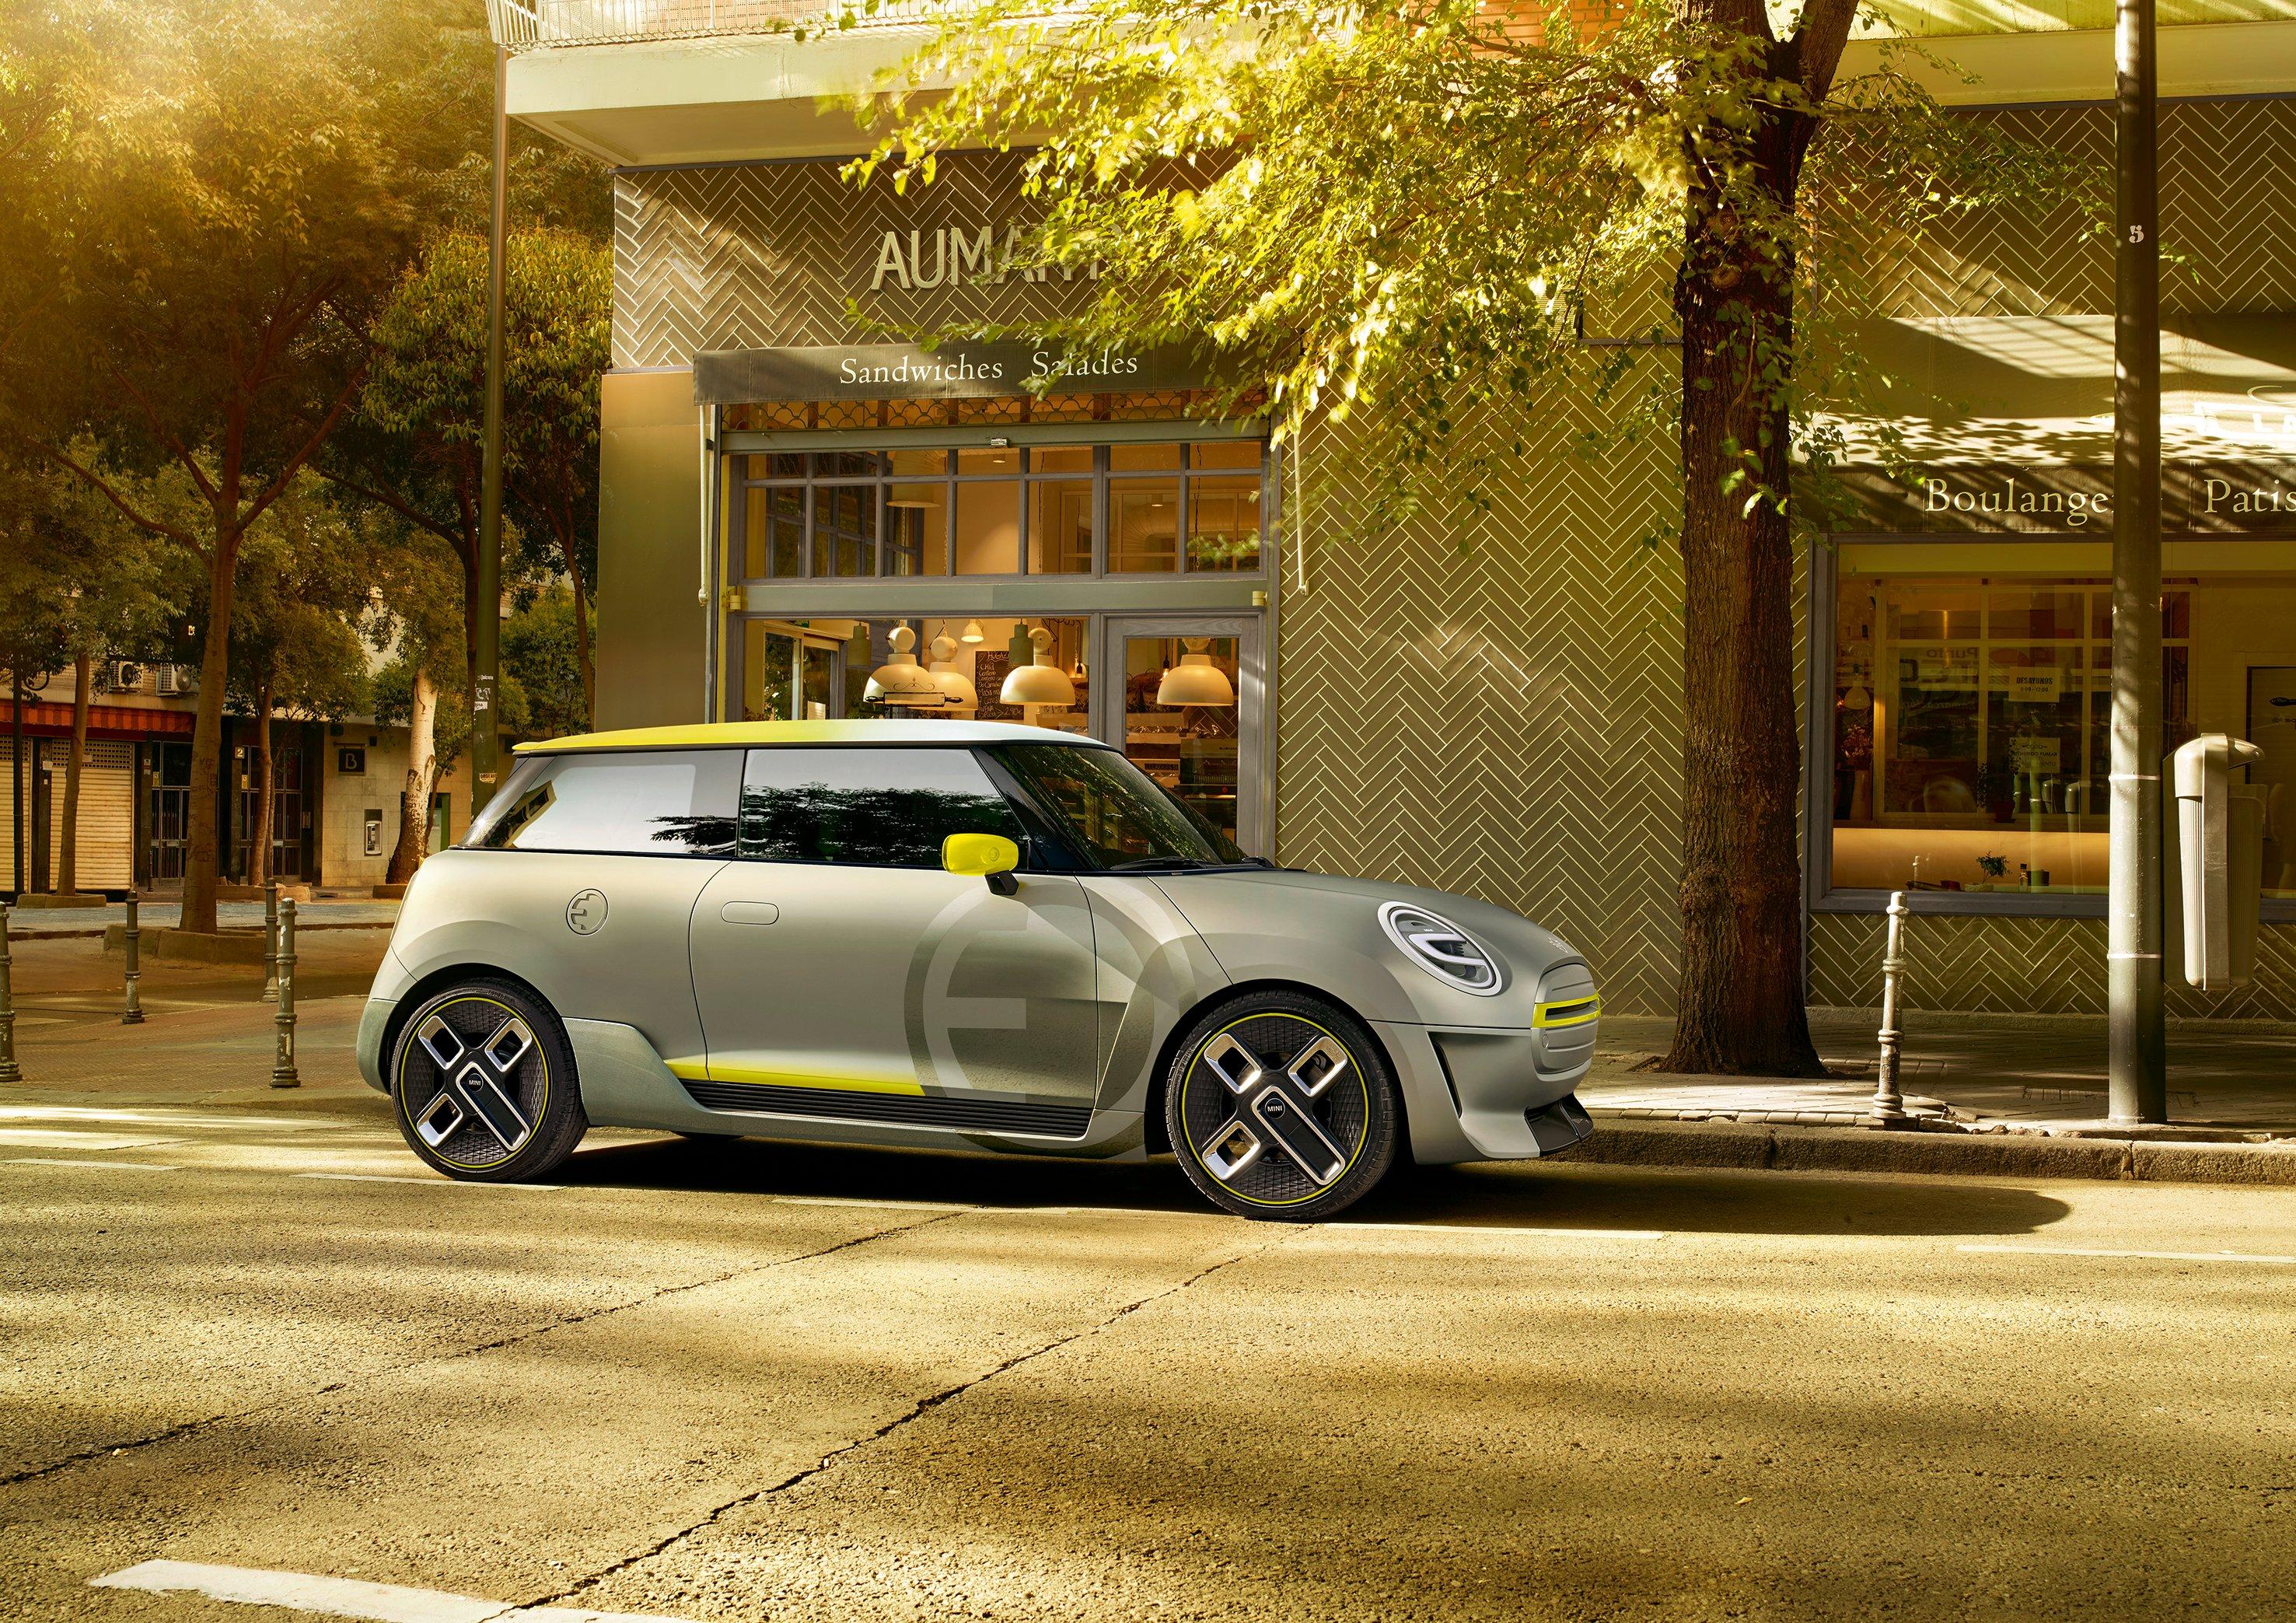 MINI presents pure-electric design study at the IAA: the MINI Electric Concept, complete with iconic design and urban driving fun.